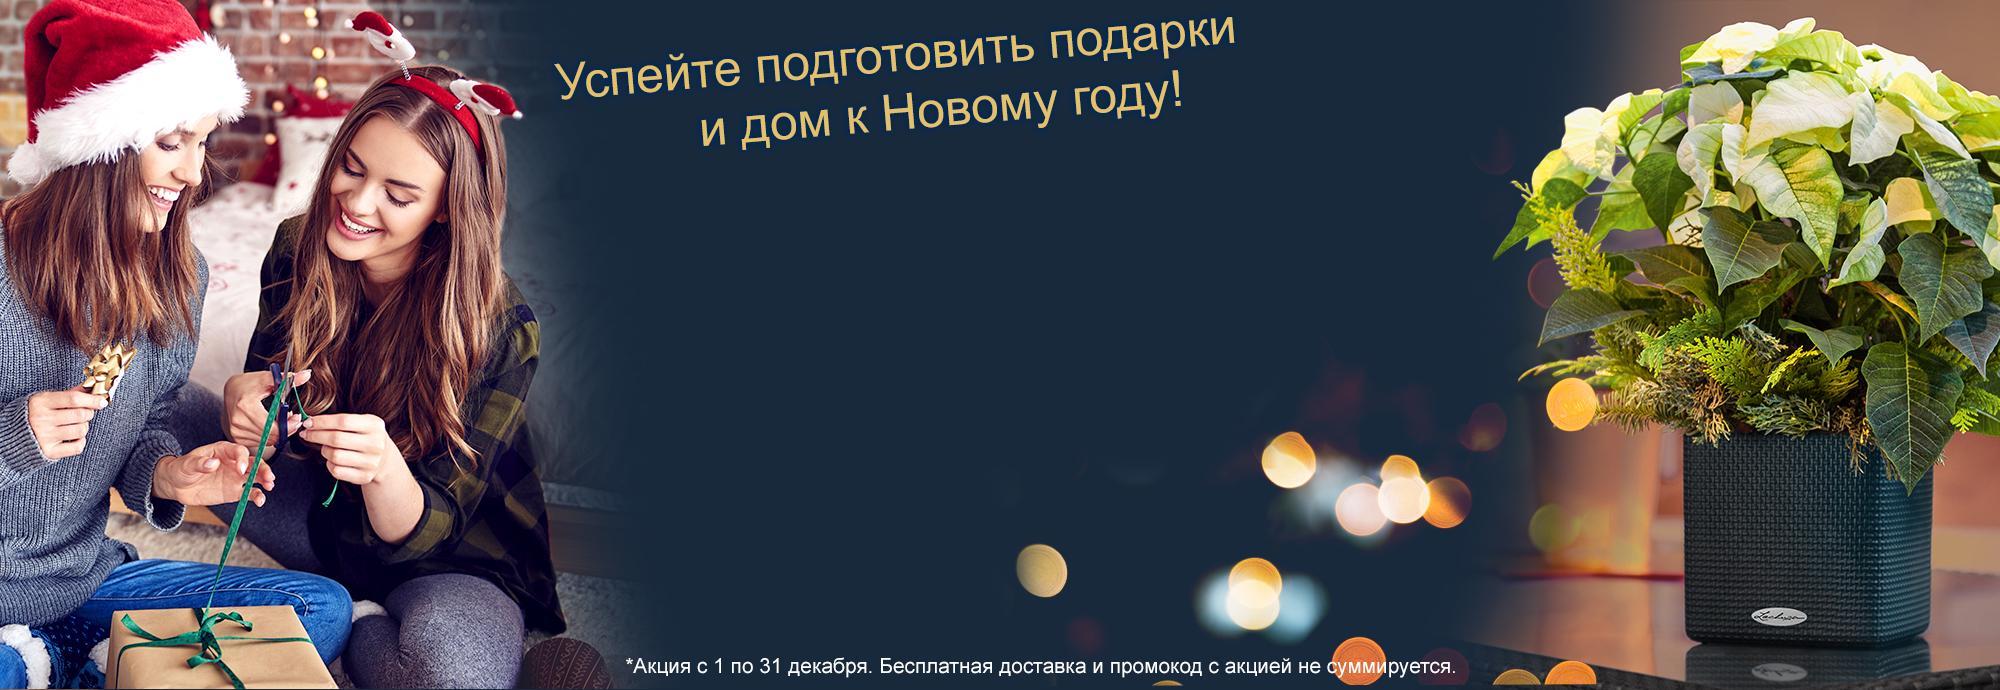 hero_banner_promo12-2019_ru